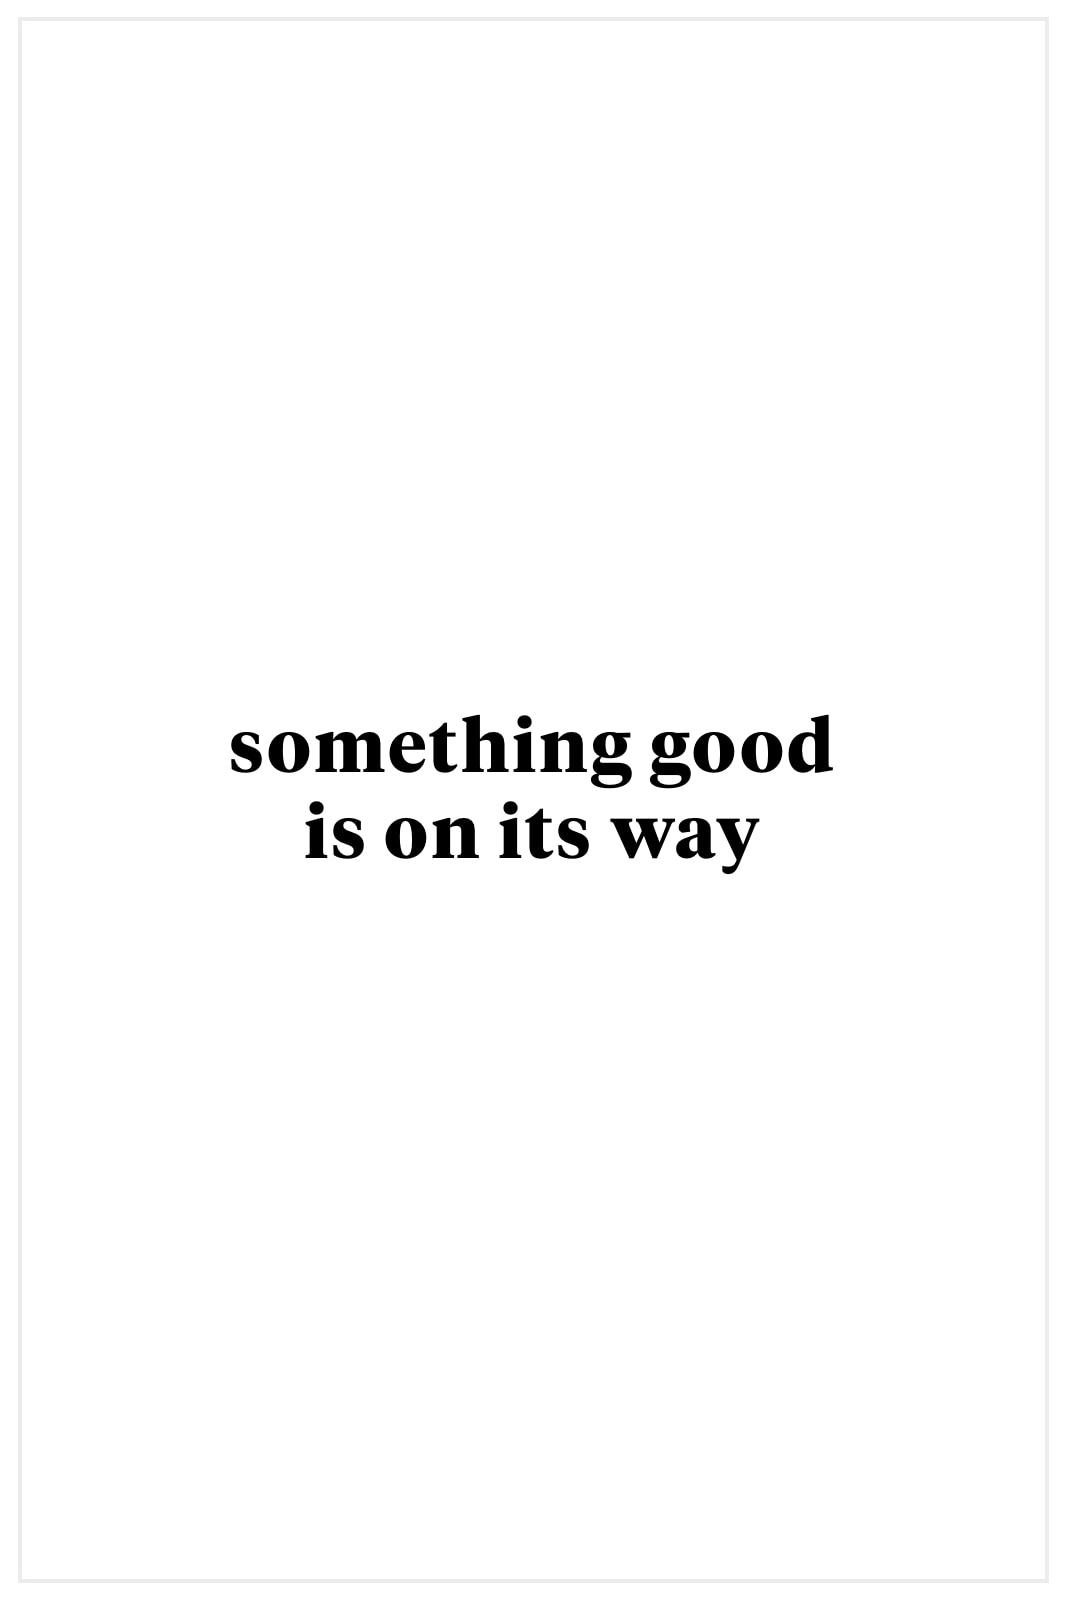 John and jenn Finn Leopard Varsity Sweater